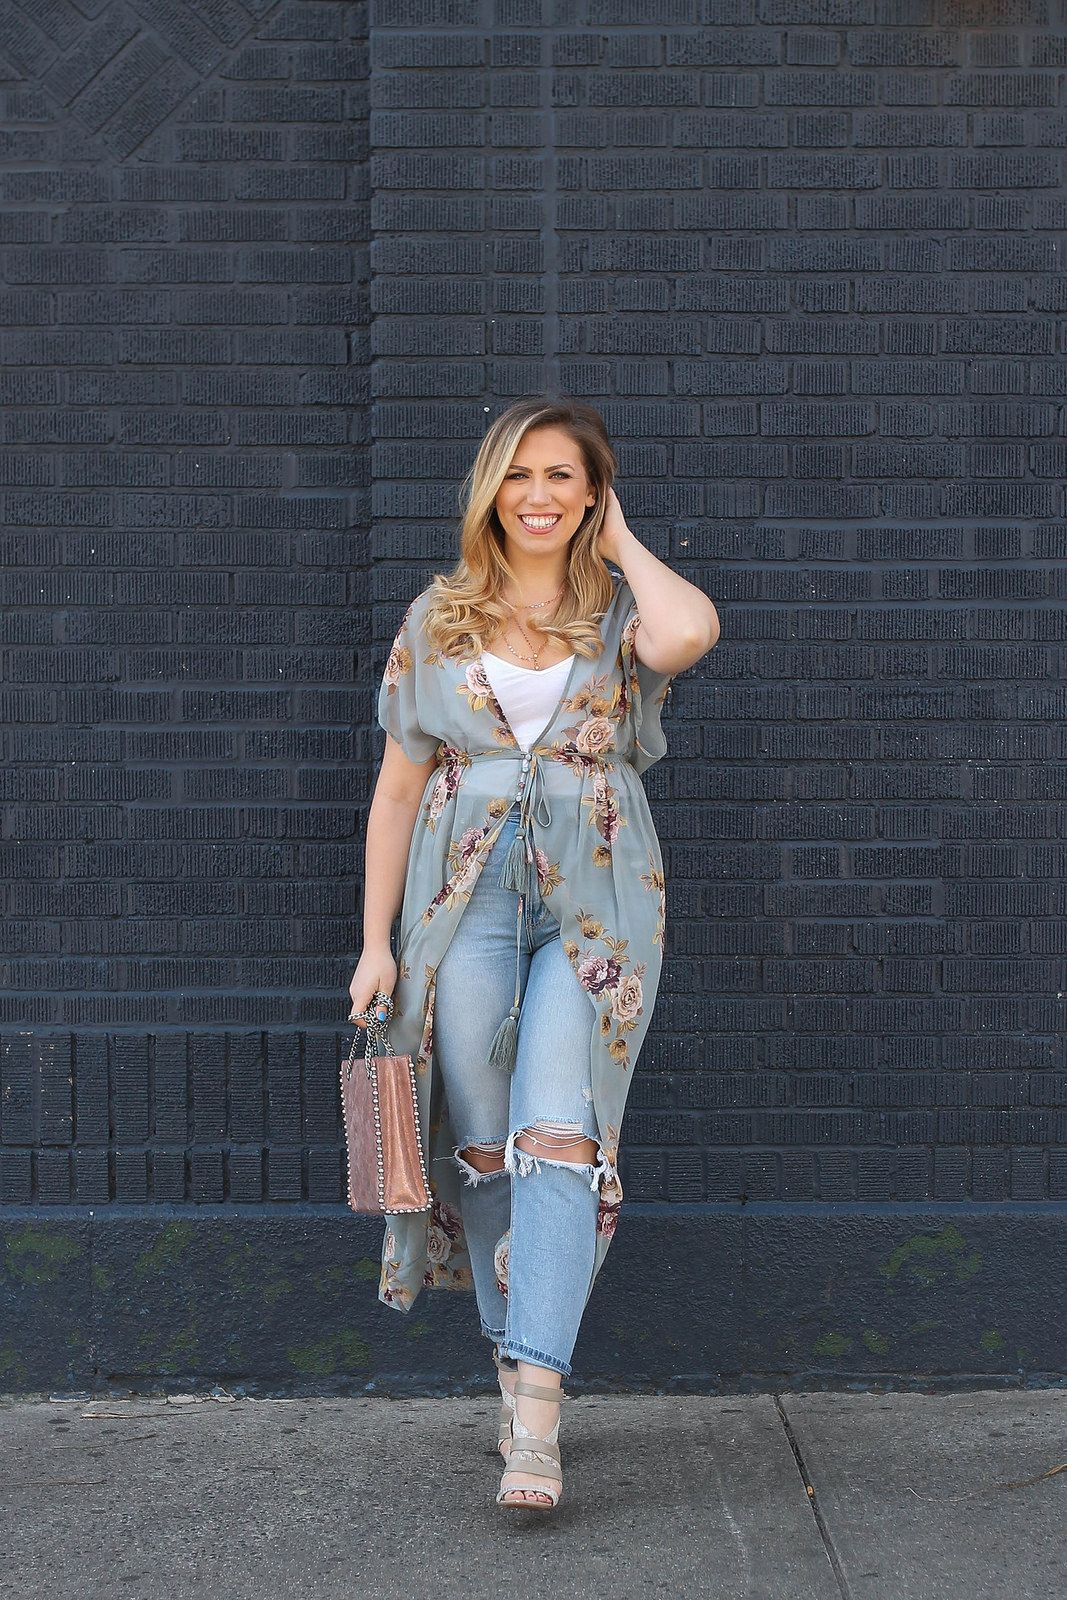 Floral Duster Sheer Kimono Outfit Mom Jeans Rose Gold Studded Zara Bag Spring Feminine